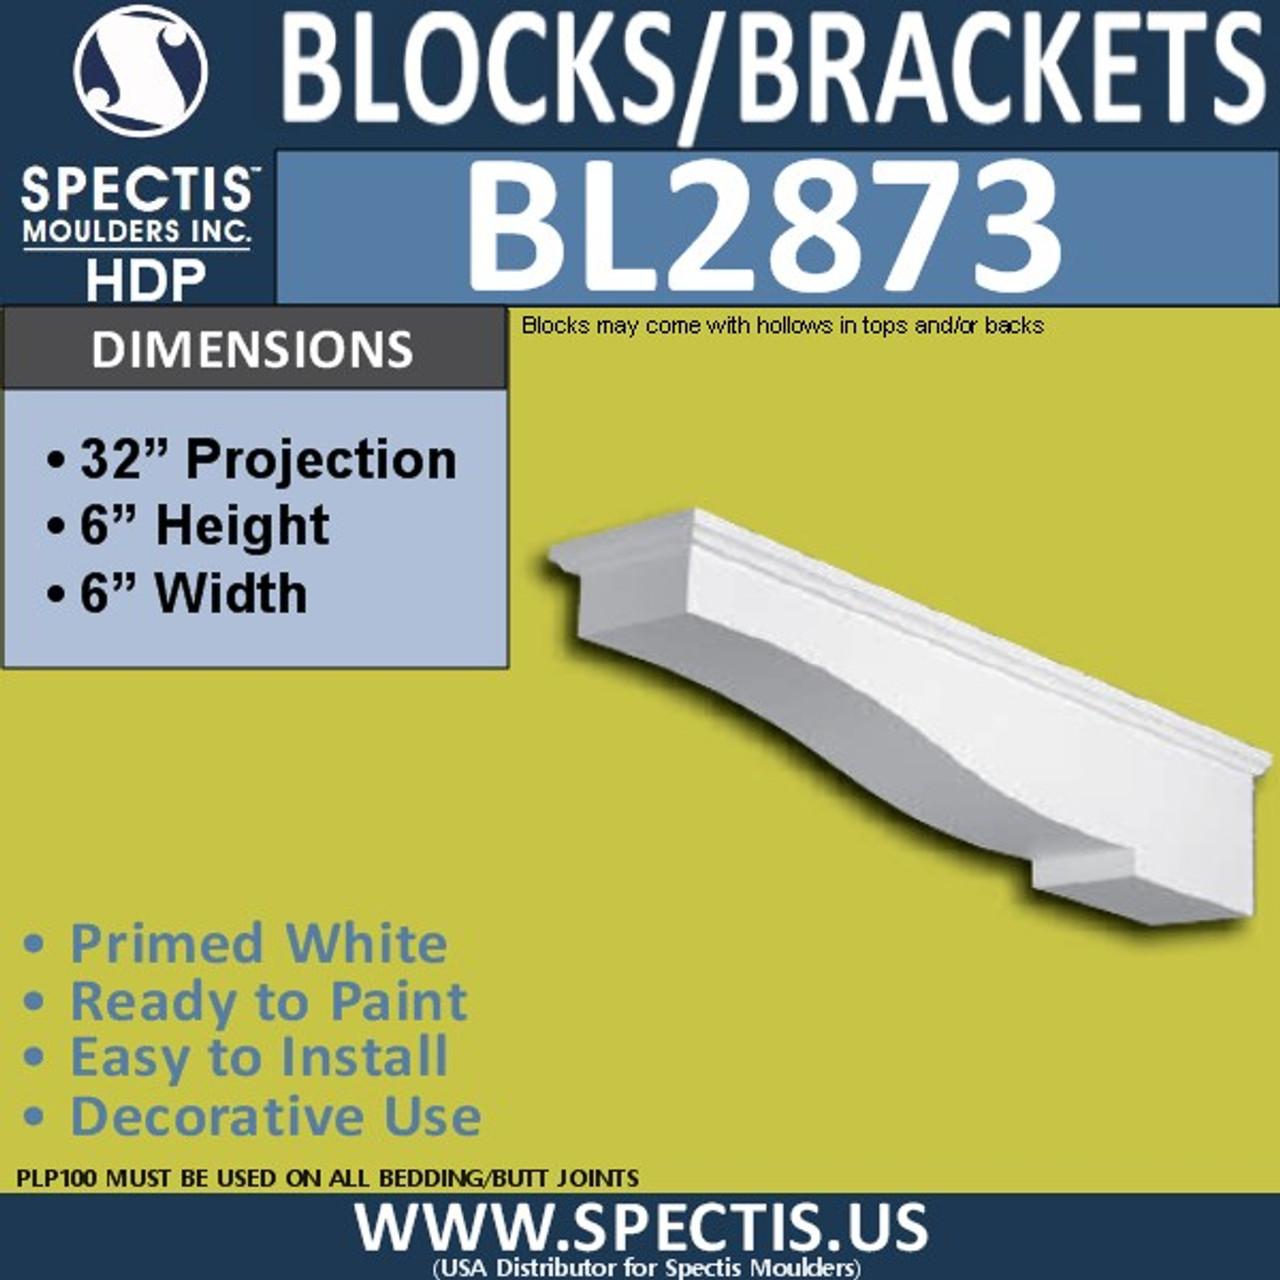 "BL2873 Eave Block or Bracket 6""W x 6""H x 32"" P"